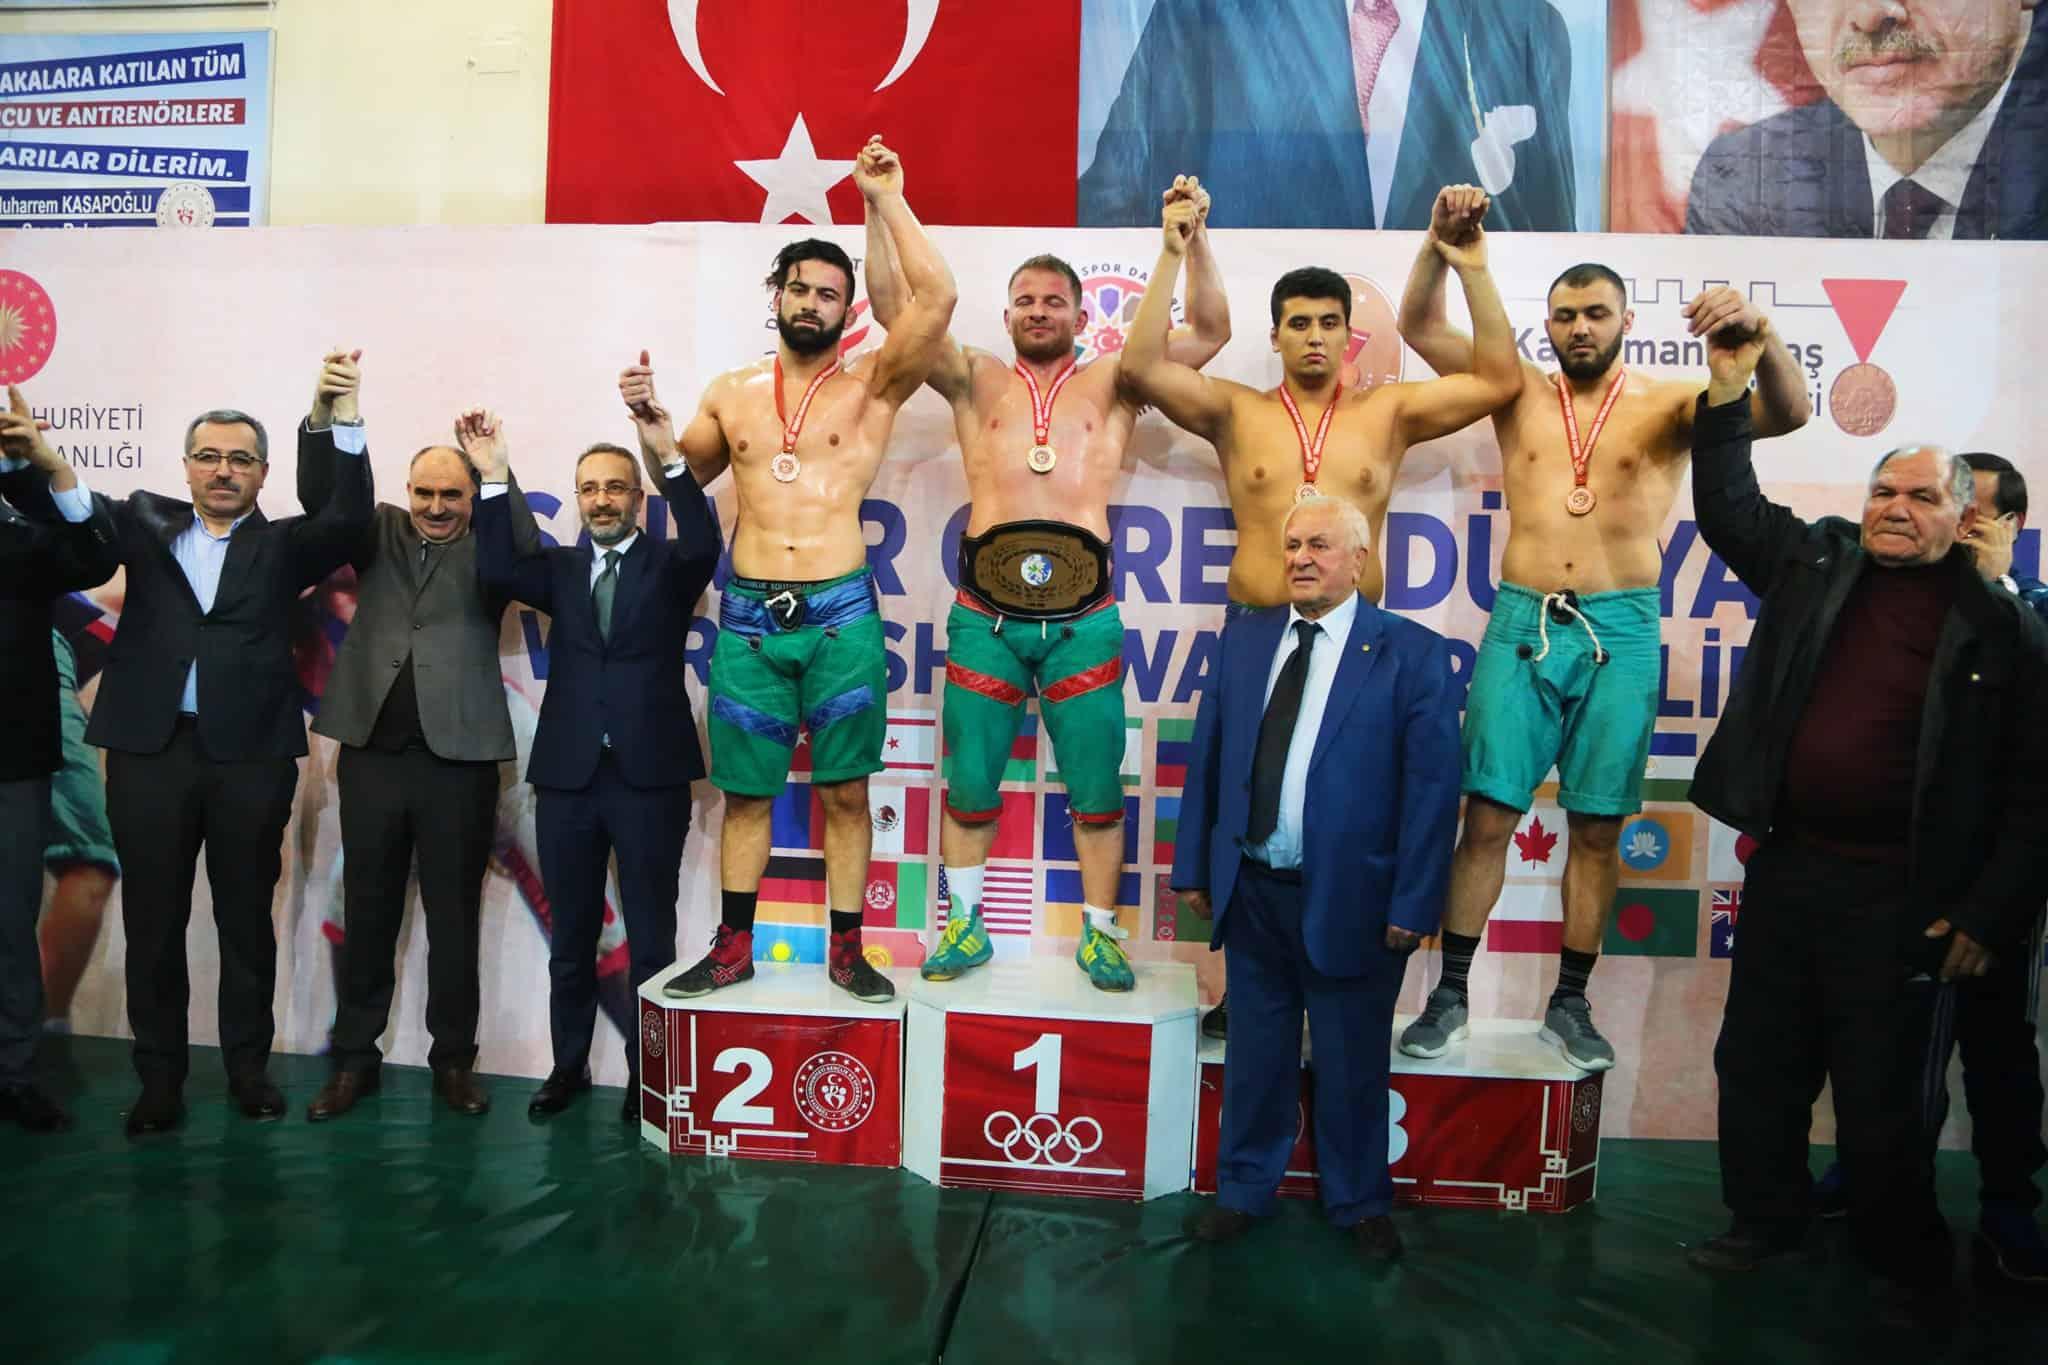 Shalwar wrestling world Championships 2020 2